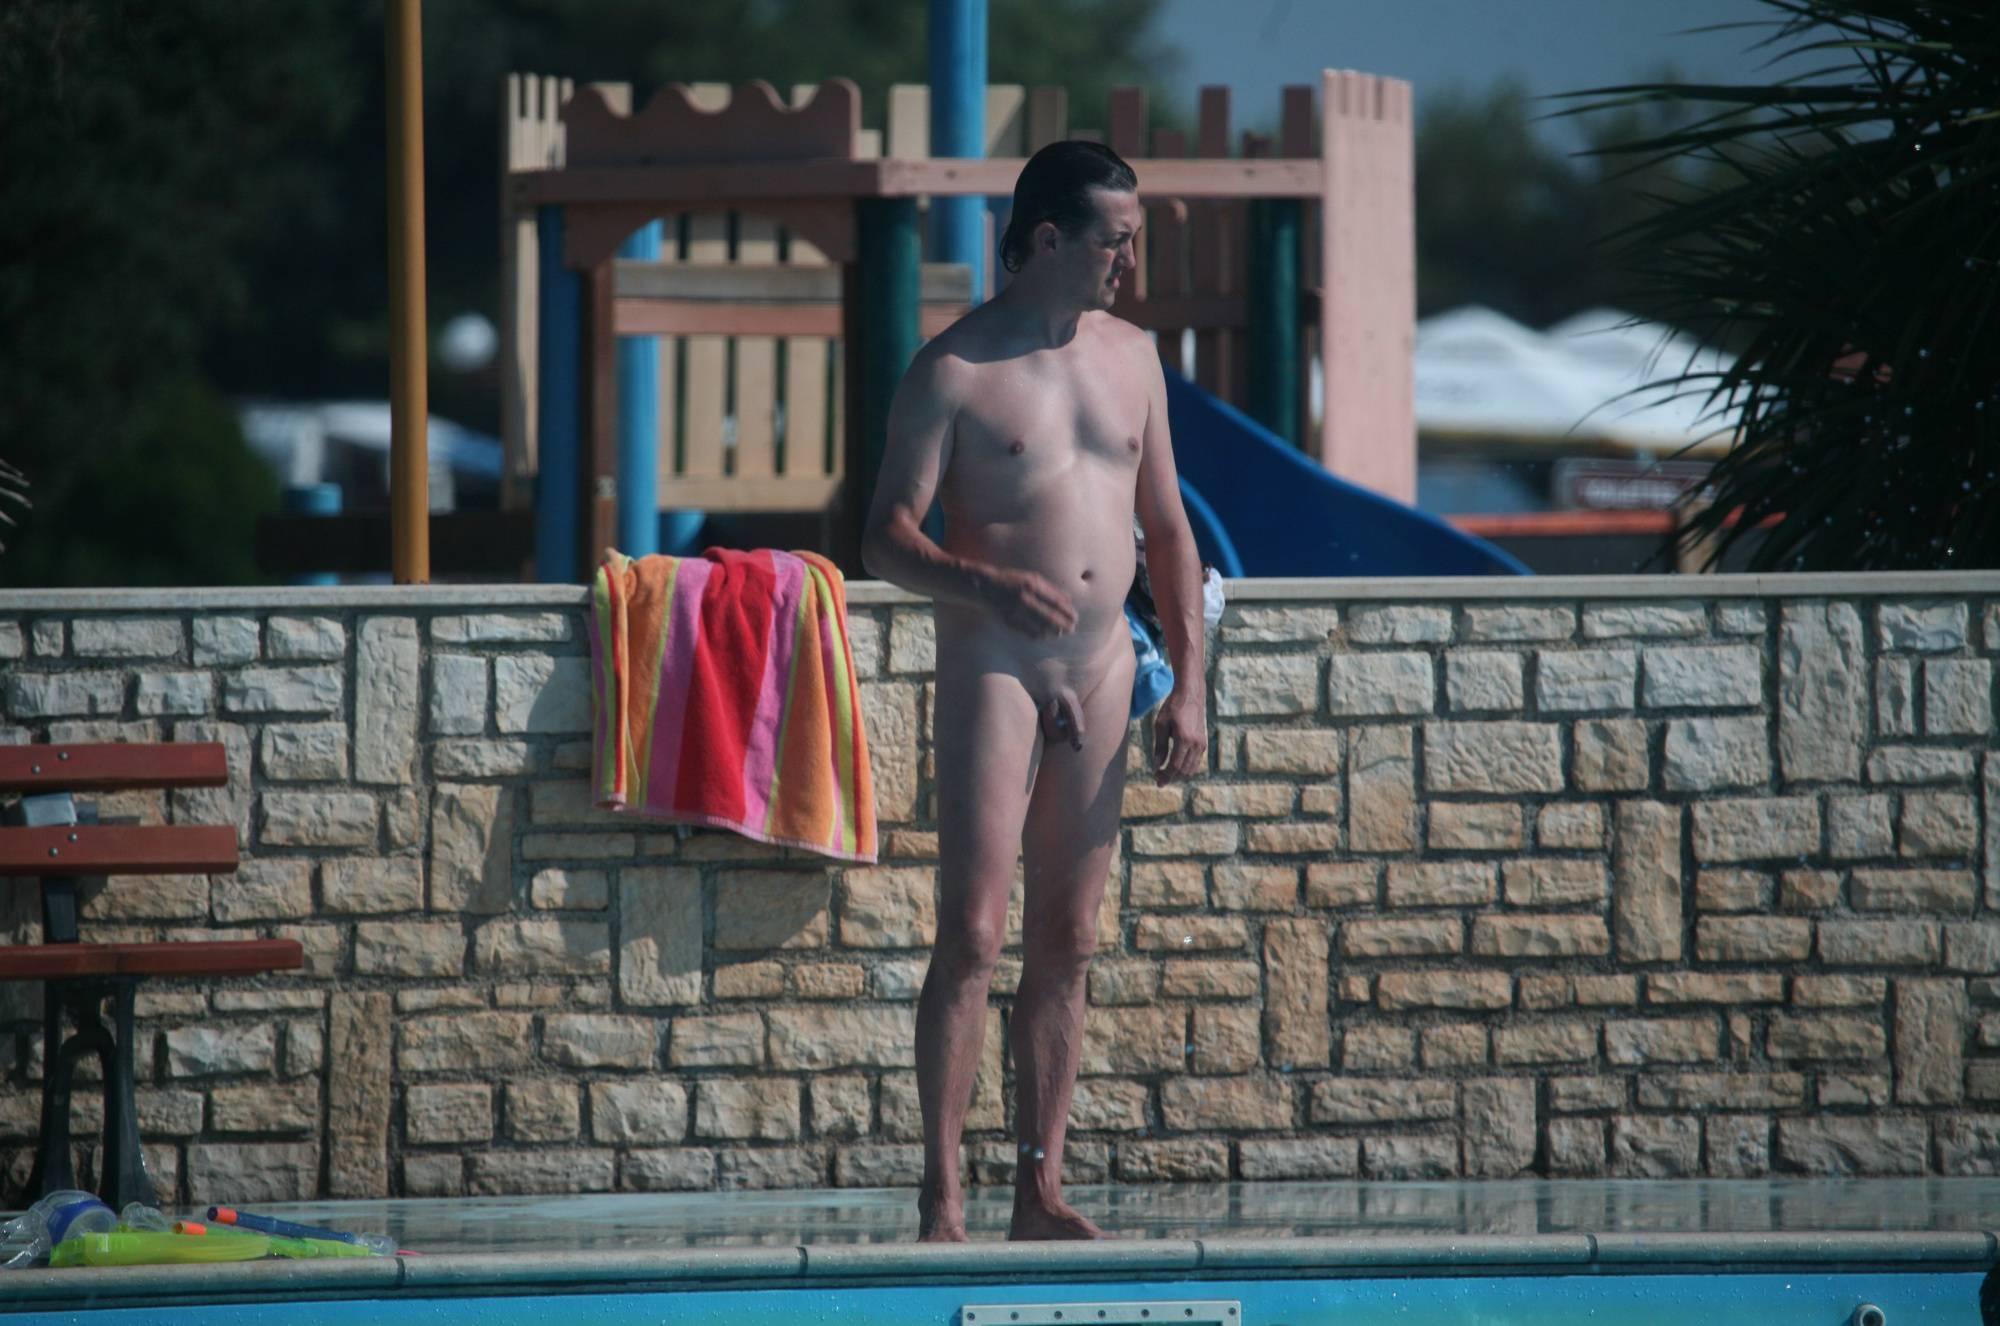 Pure Nudism Photos Naturist Pool Push-Overs - 3